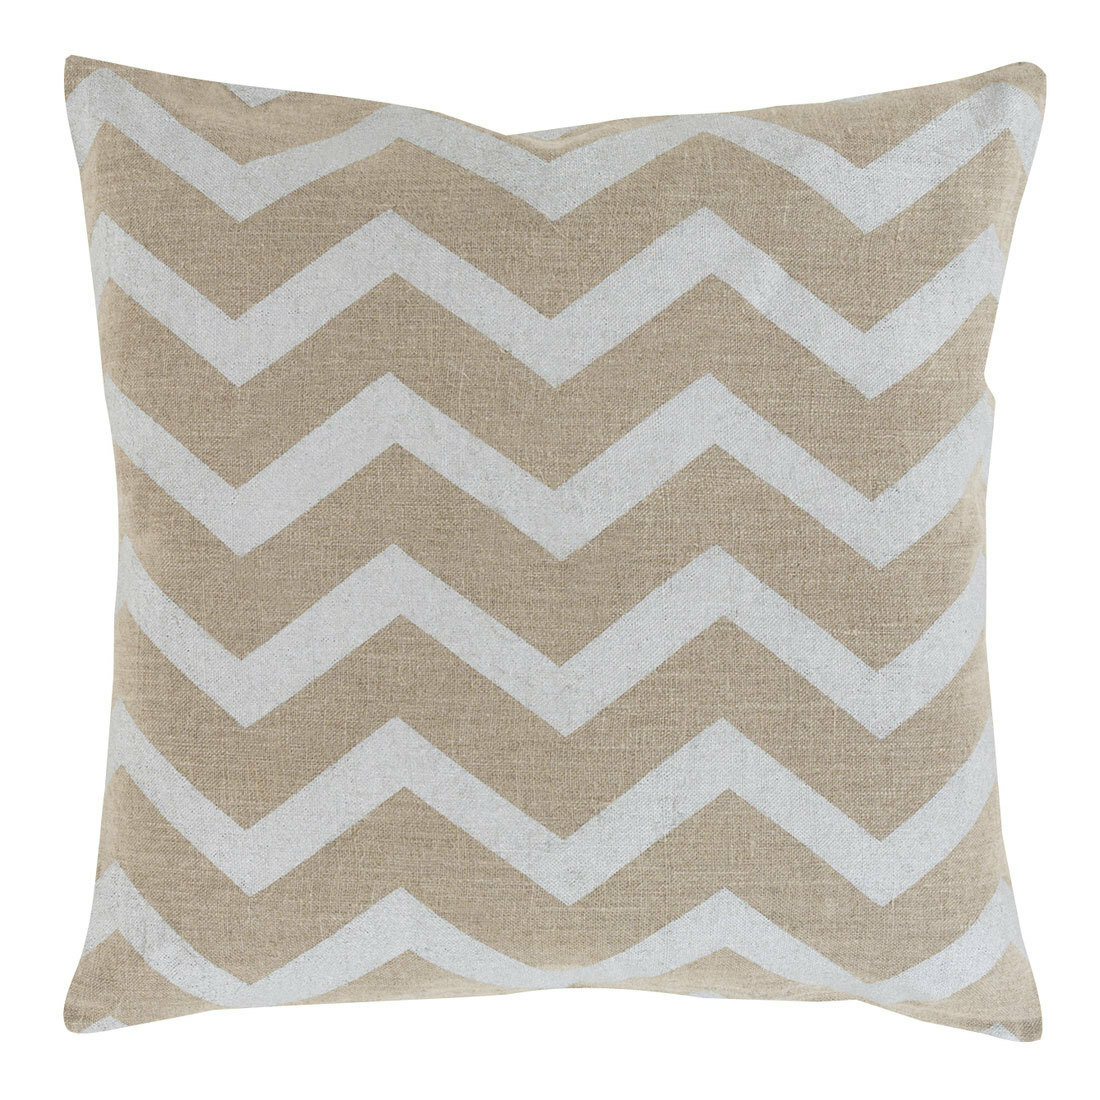 Stamped Linen Chevron Pillow - MS-002 18 x 18 inches Linen Beige